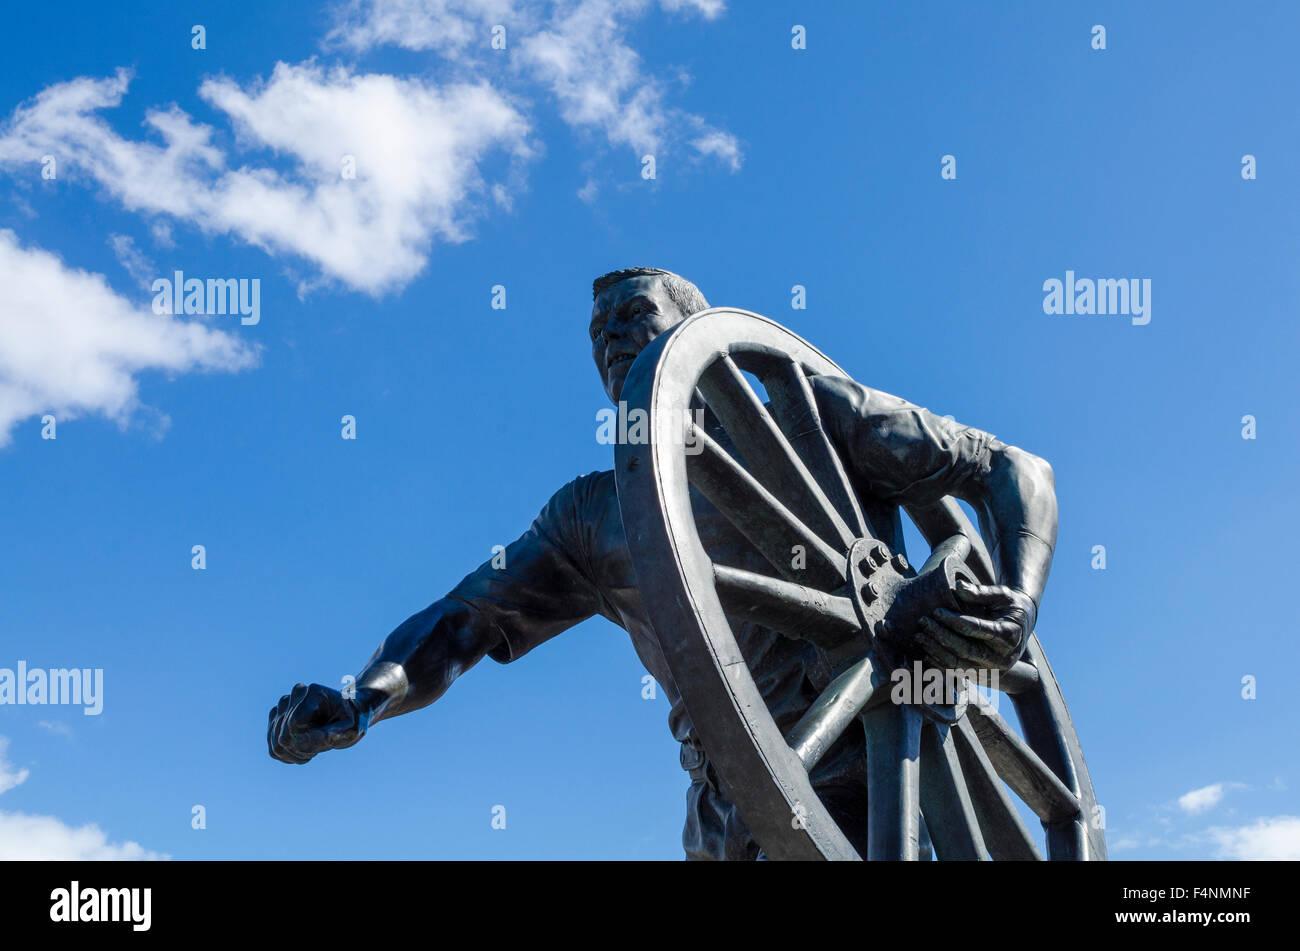 Field Gun Runner statue at Portsmouth Historic Dockyard, Hampshire, England. - Stock Image